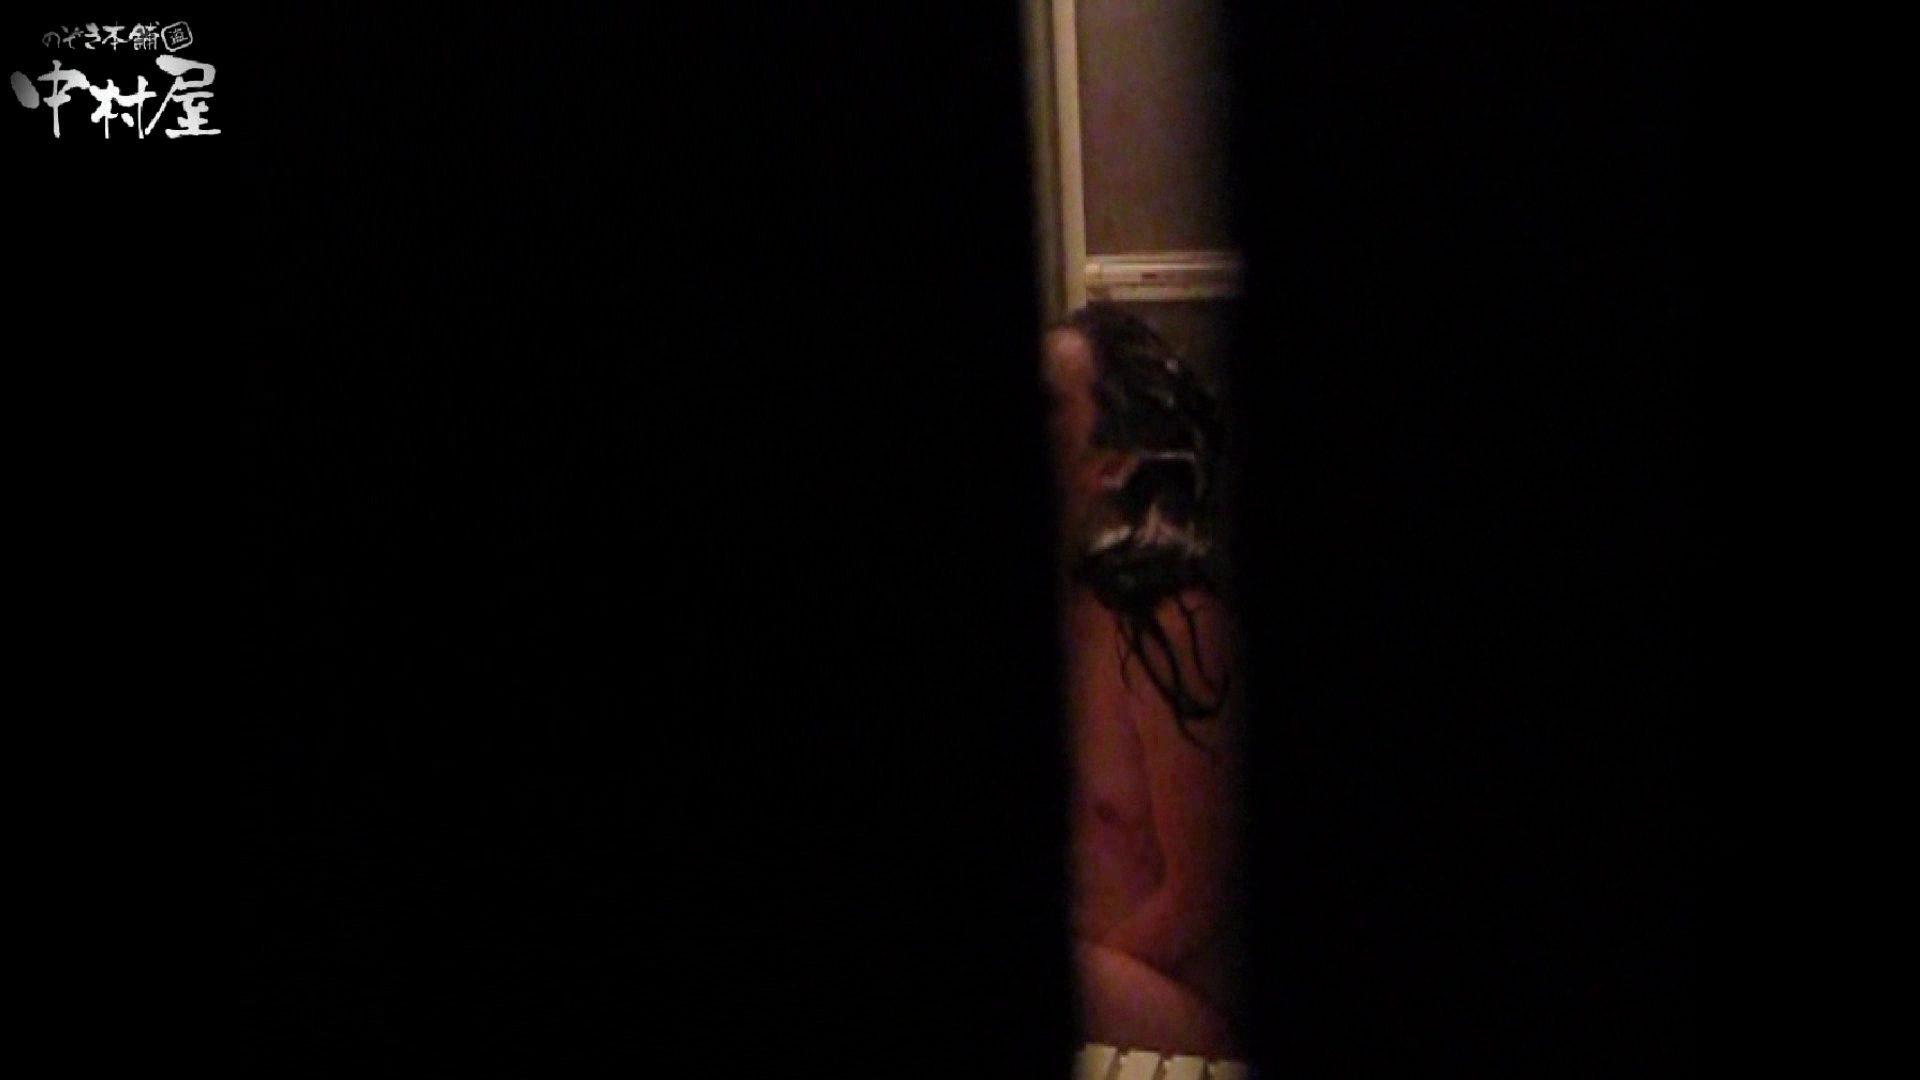 民家風呂専門盗撮師の超危険映像 vol.004 エロい美少女  89PIX 5